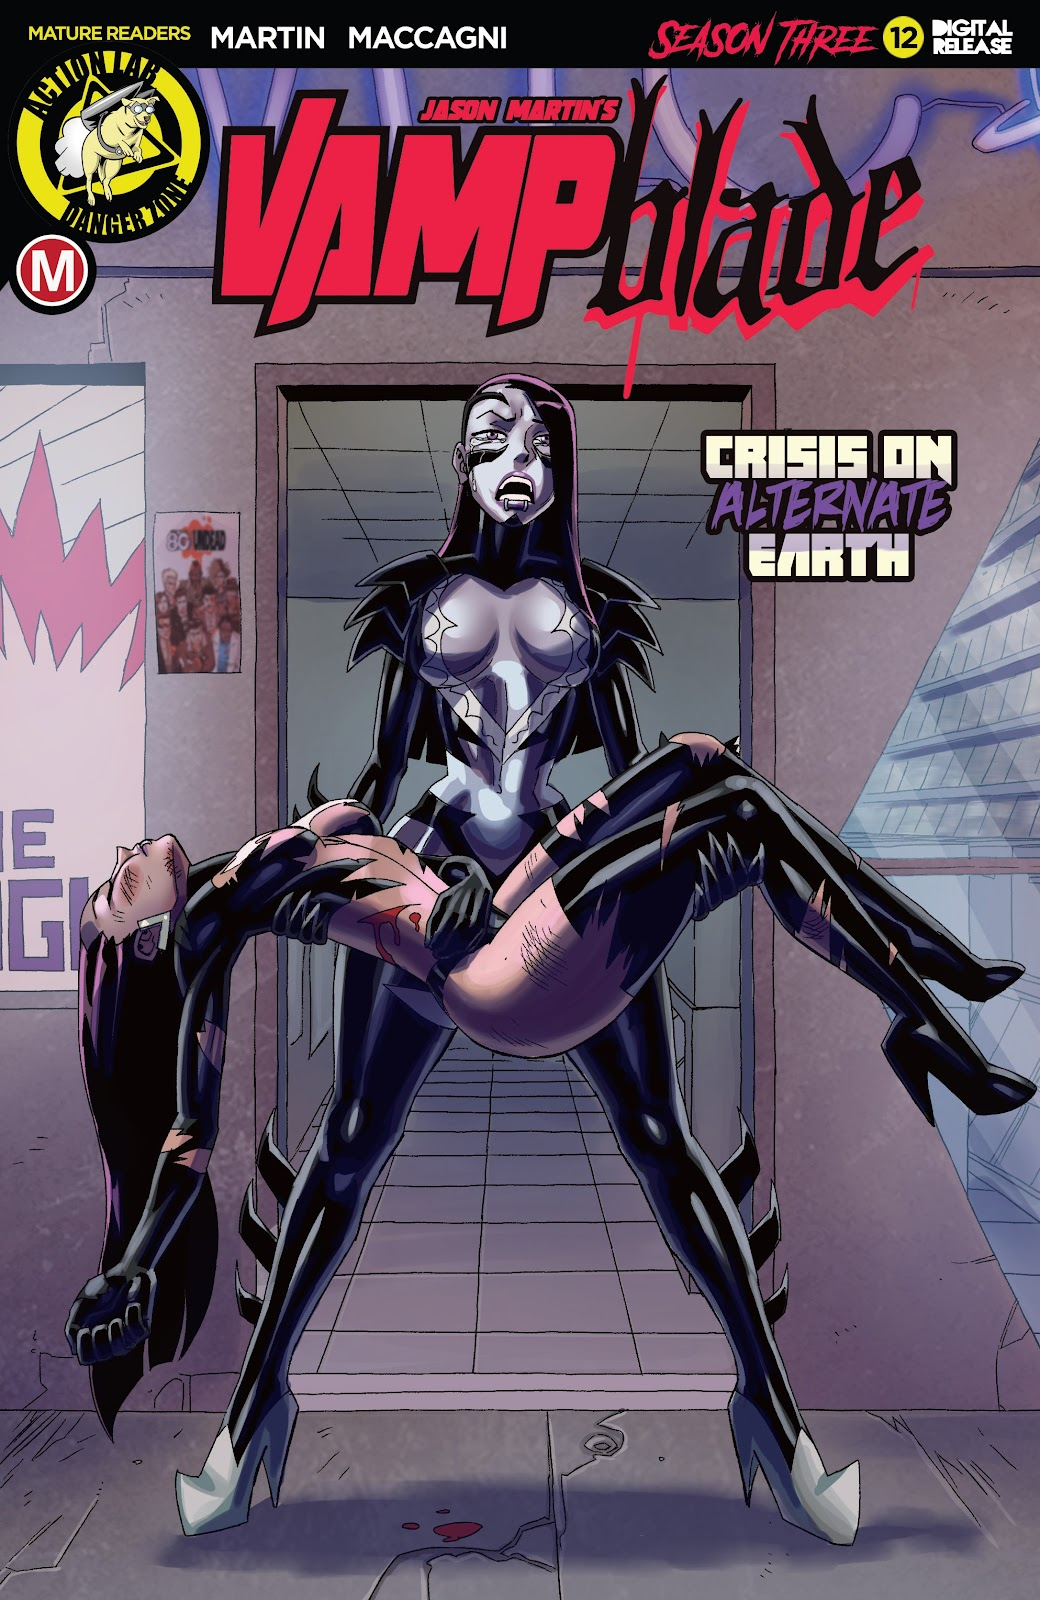 Read online Vampblade Season 3 comic -  Issue #12 - 1